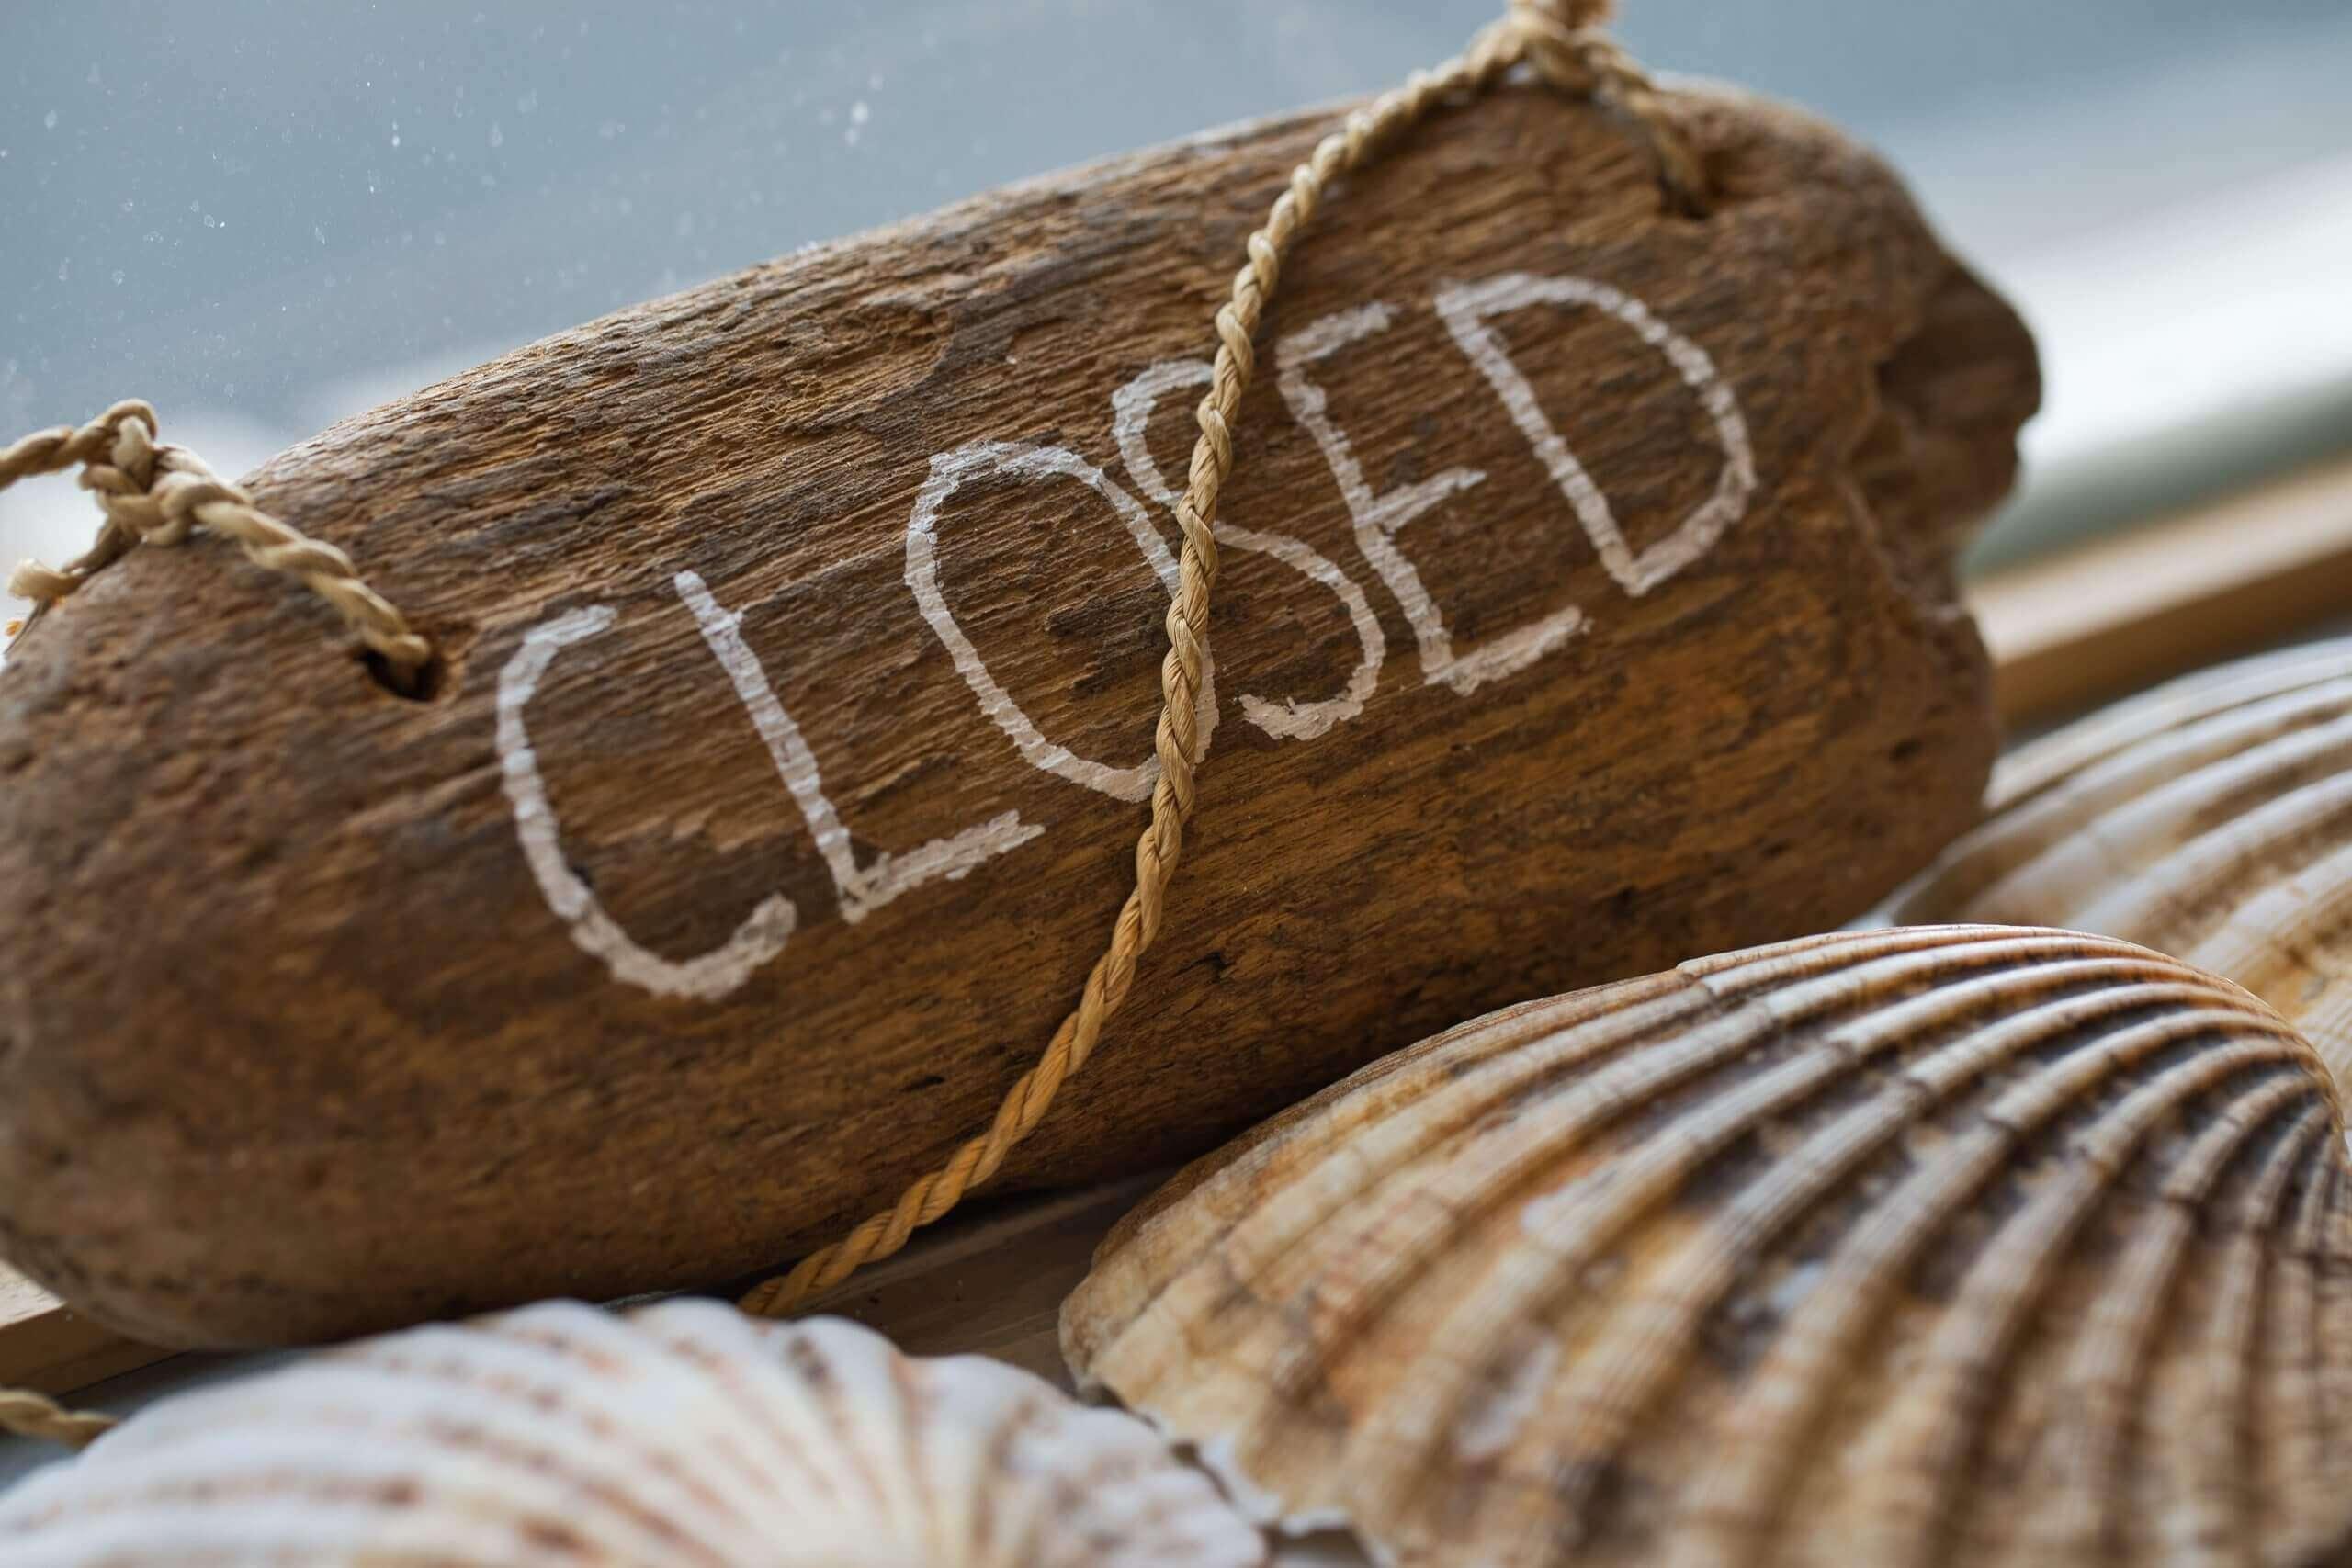 Closed_G1A0020